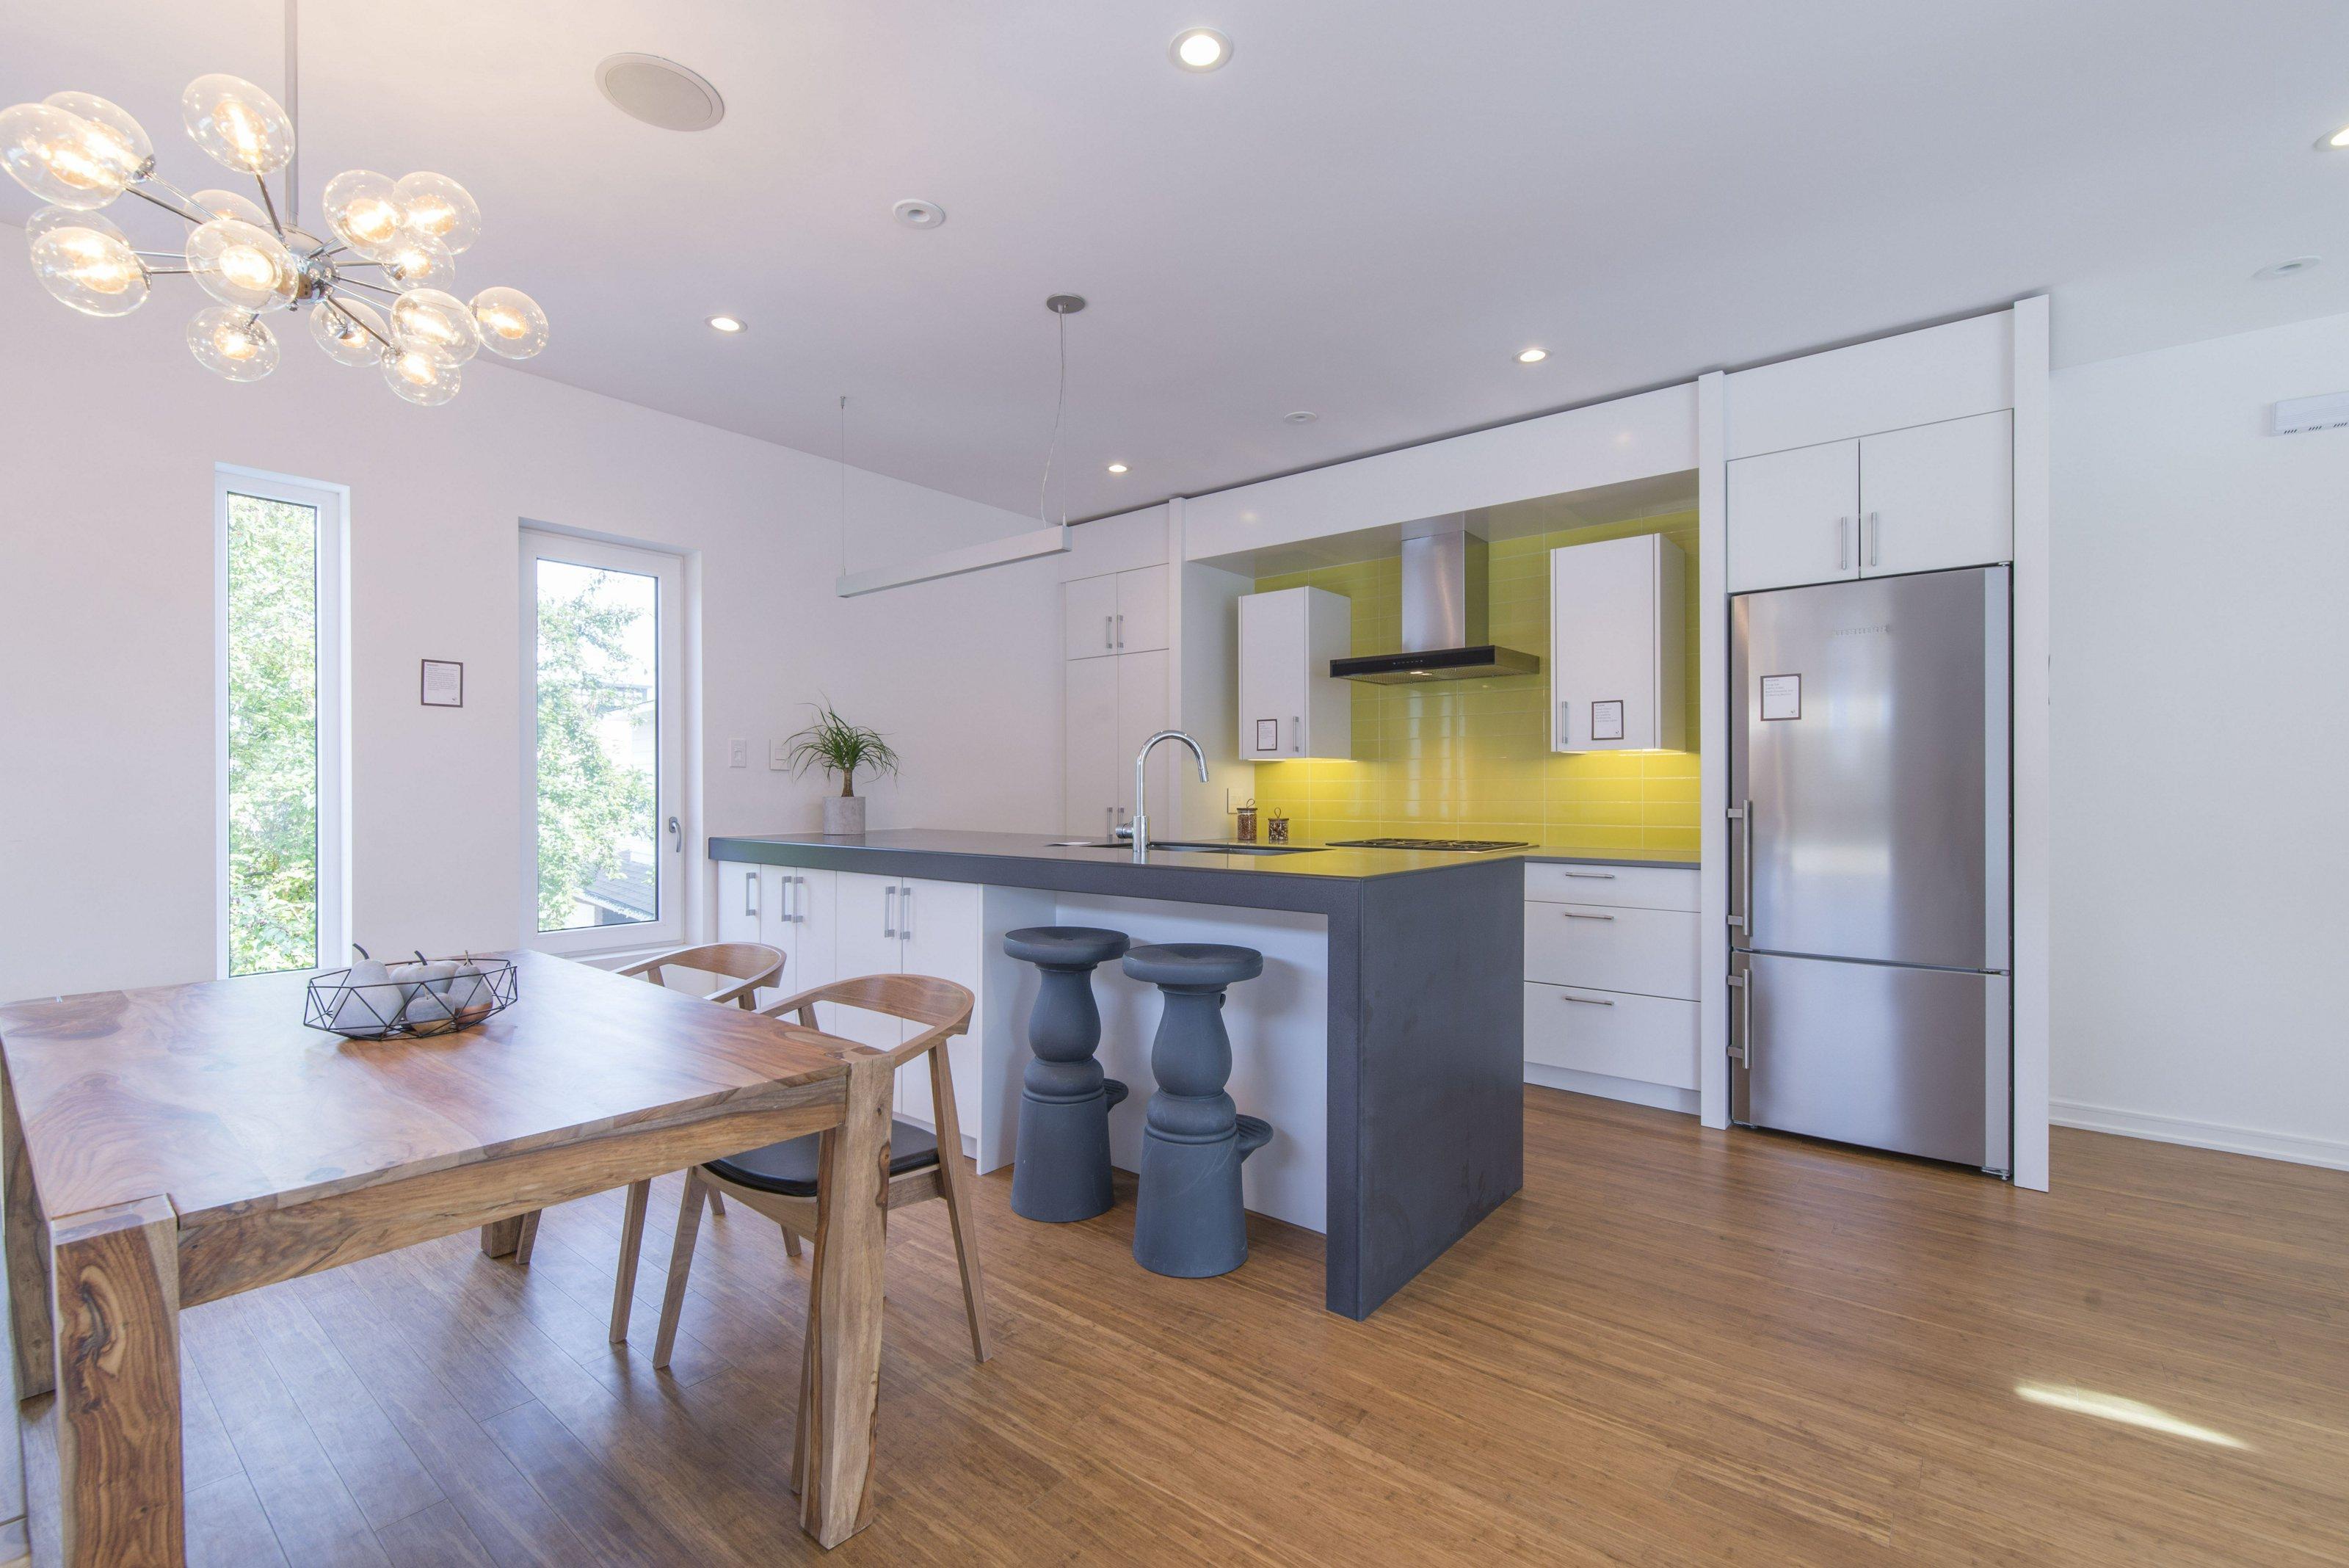 The beautiful bright kitchen.